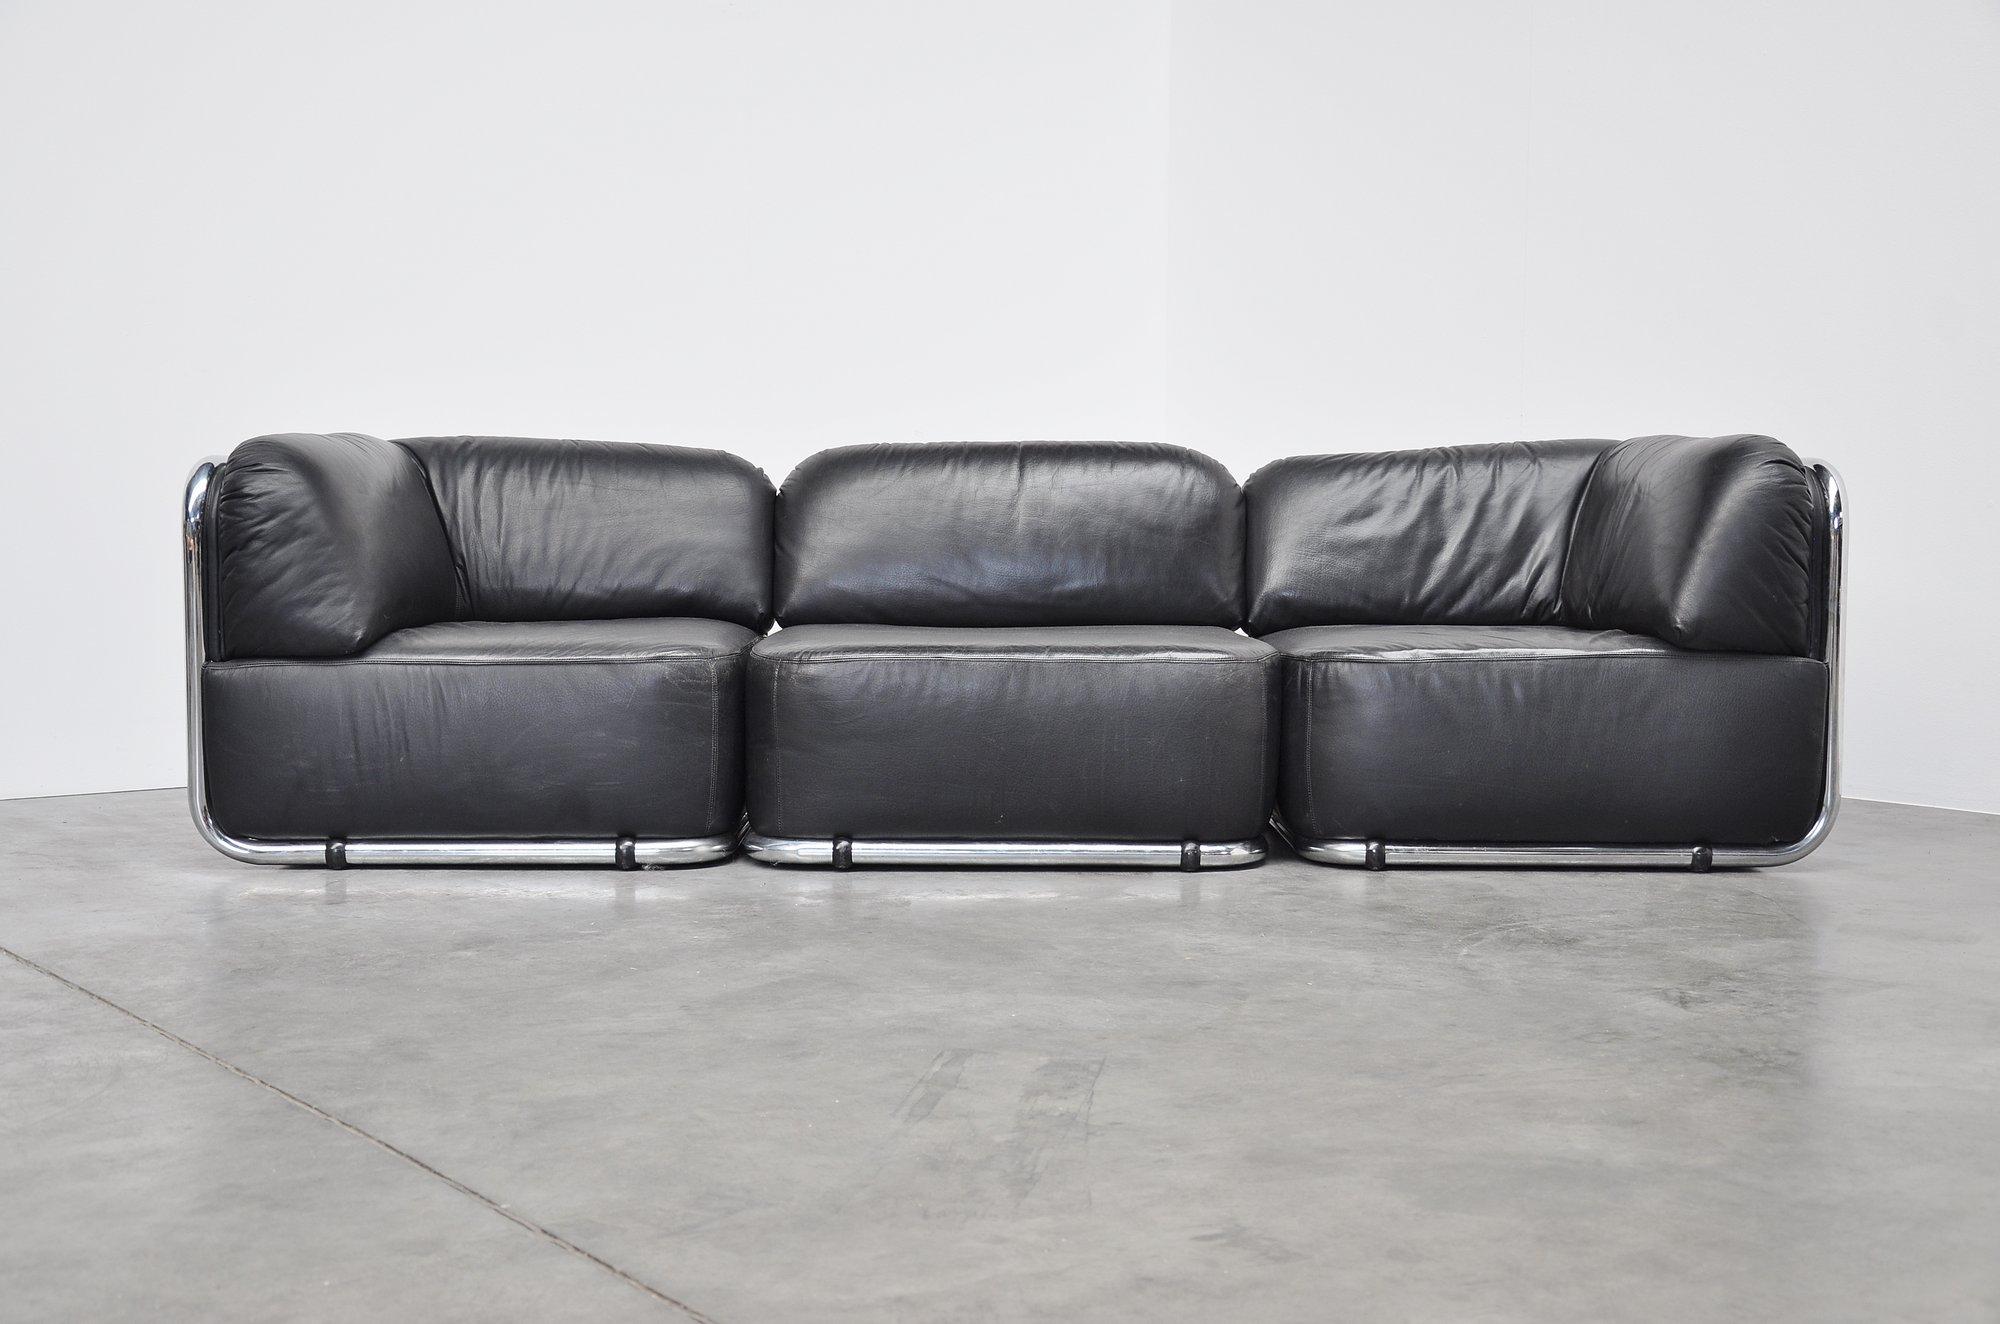 geoffrey d harcourt 1970. Black Bedroom Furniture Sets. Home Design Ideas